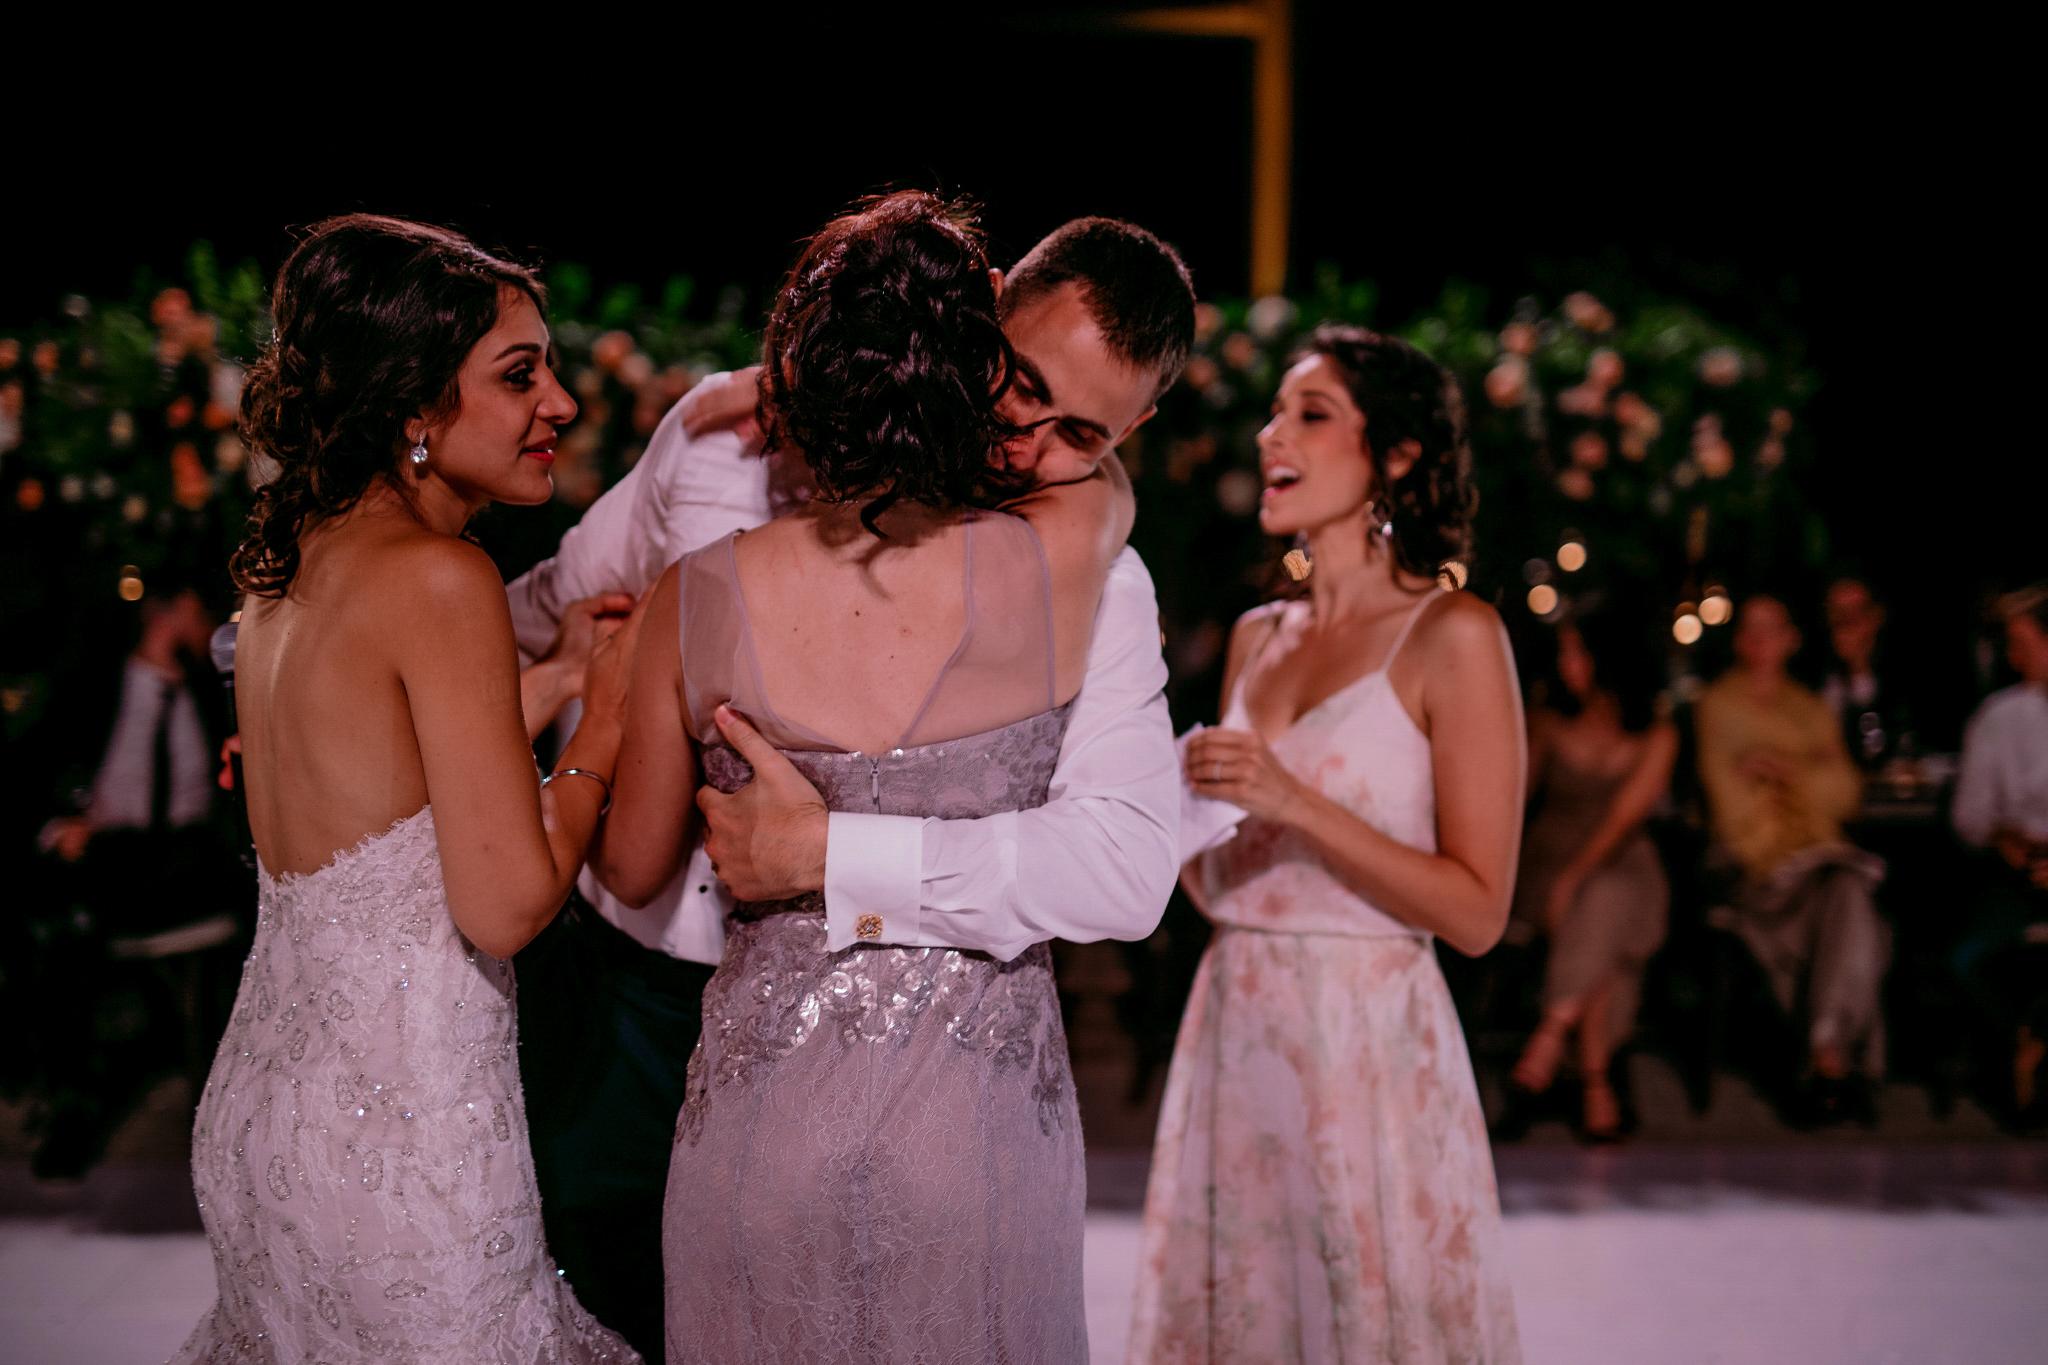 san diego wedding   photographer | groom hugs woman in grey dress while bride looks on